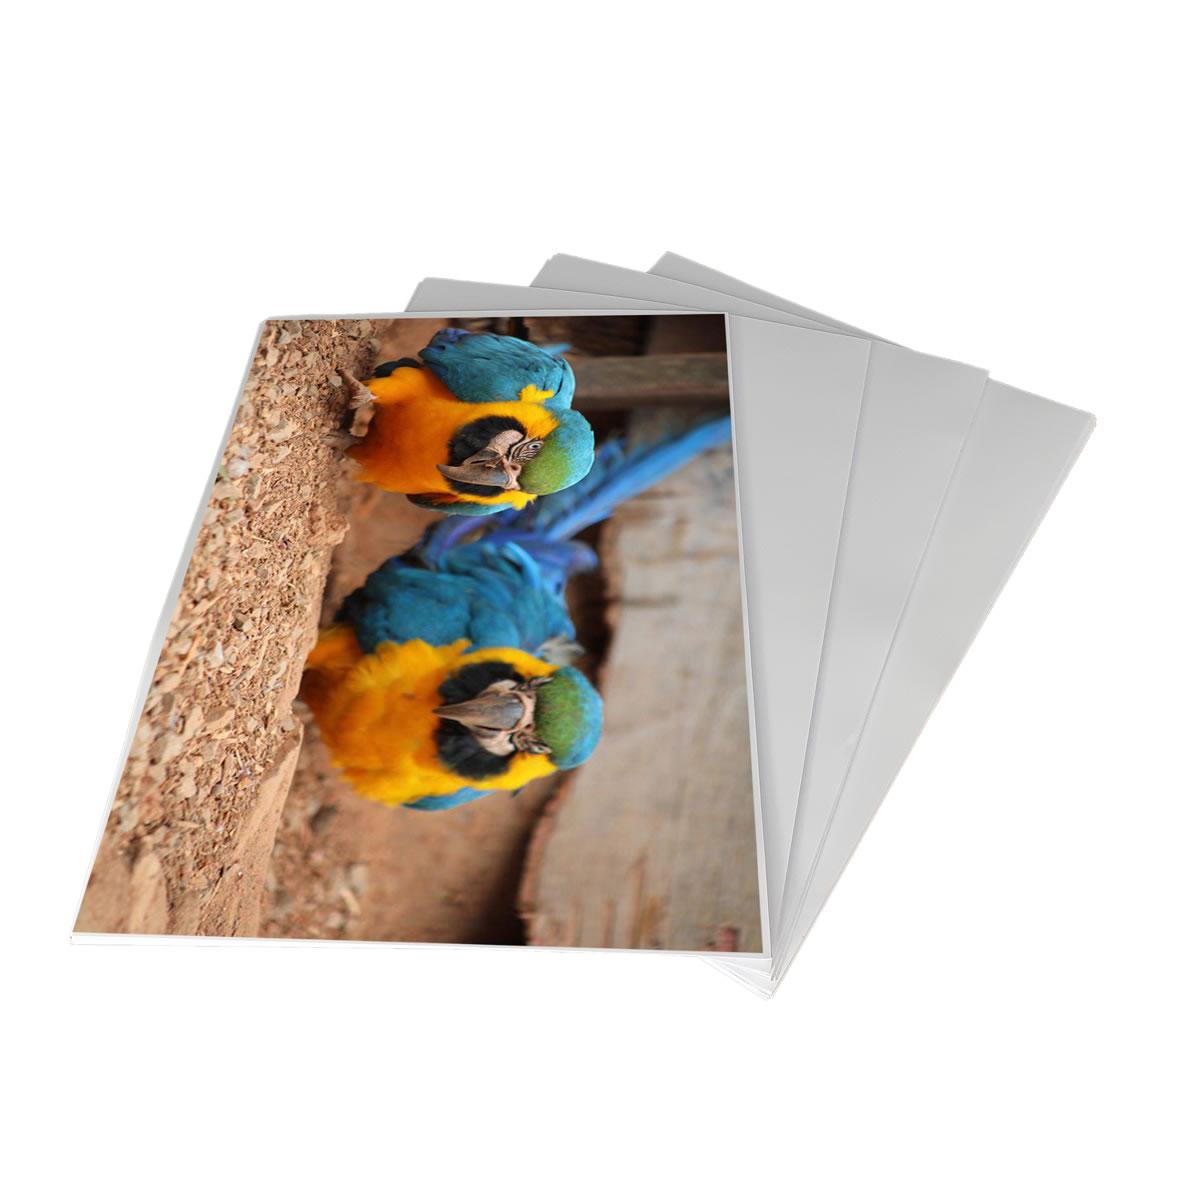 Papel Foto Resistente a Água 180g 20fls Fotográfico Glossy